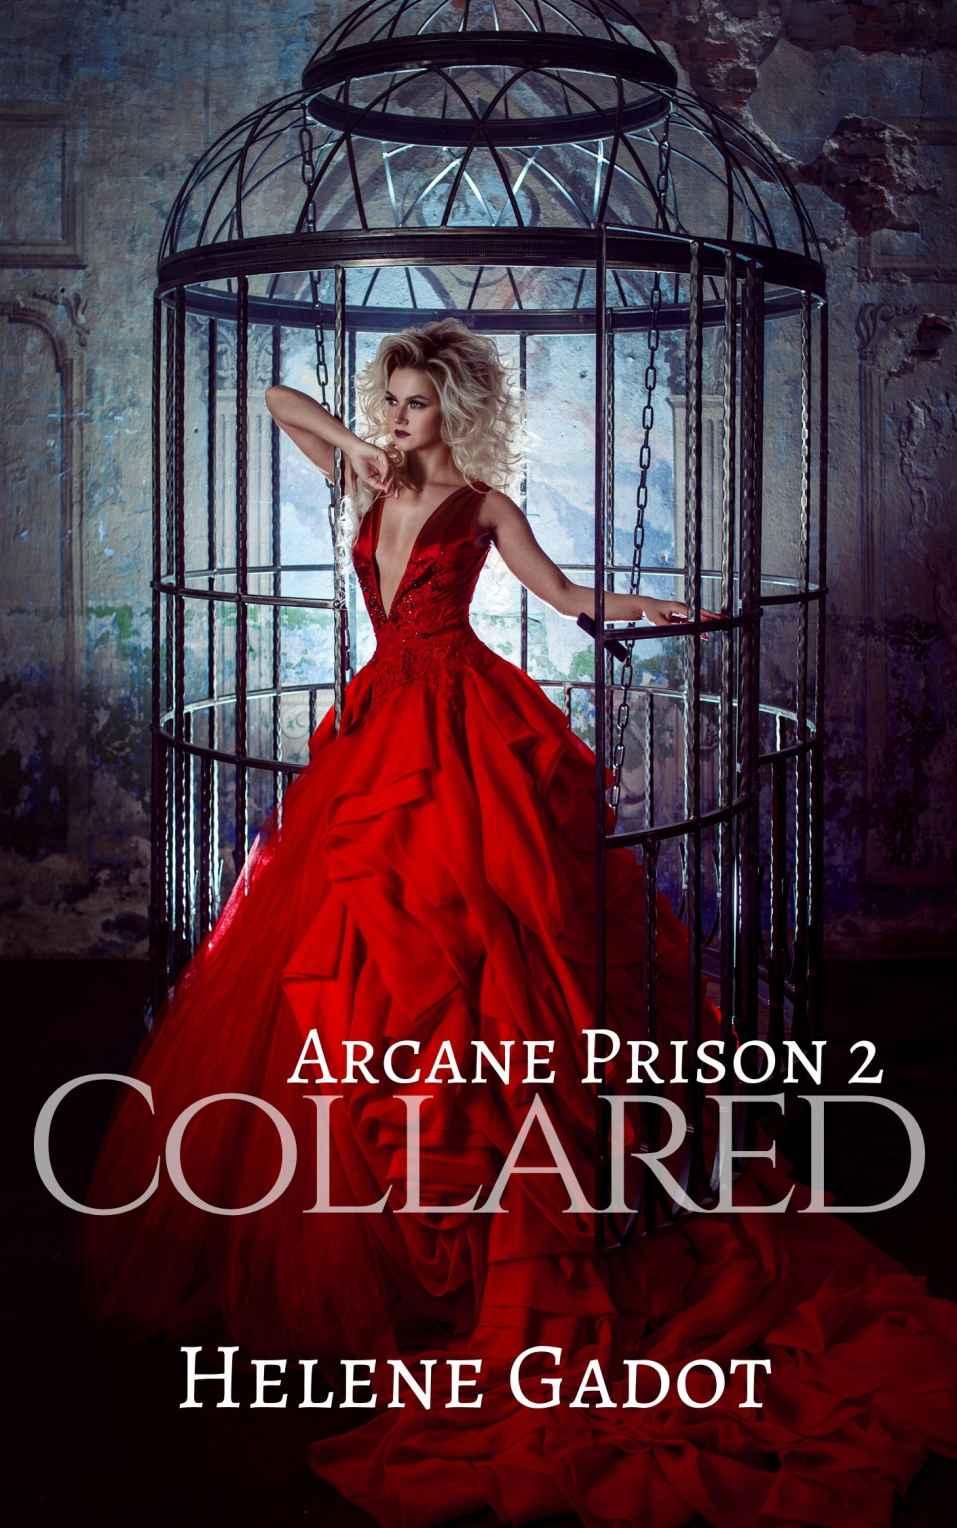 Collared (Arcane Prison, #2)